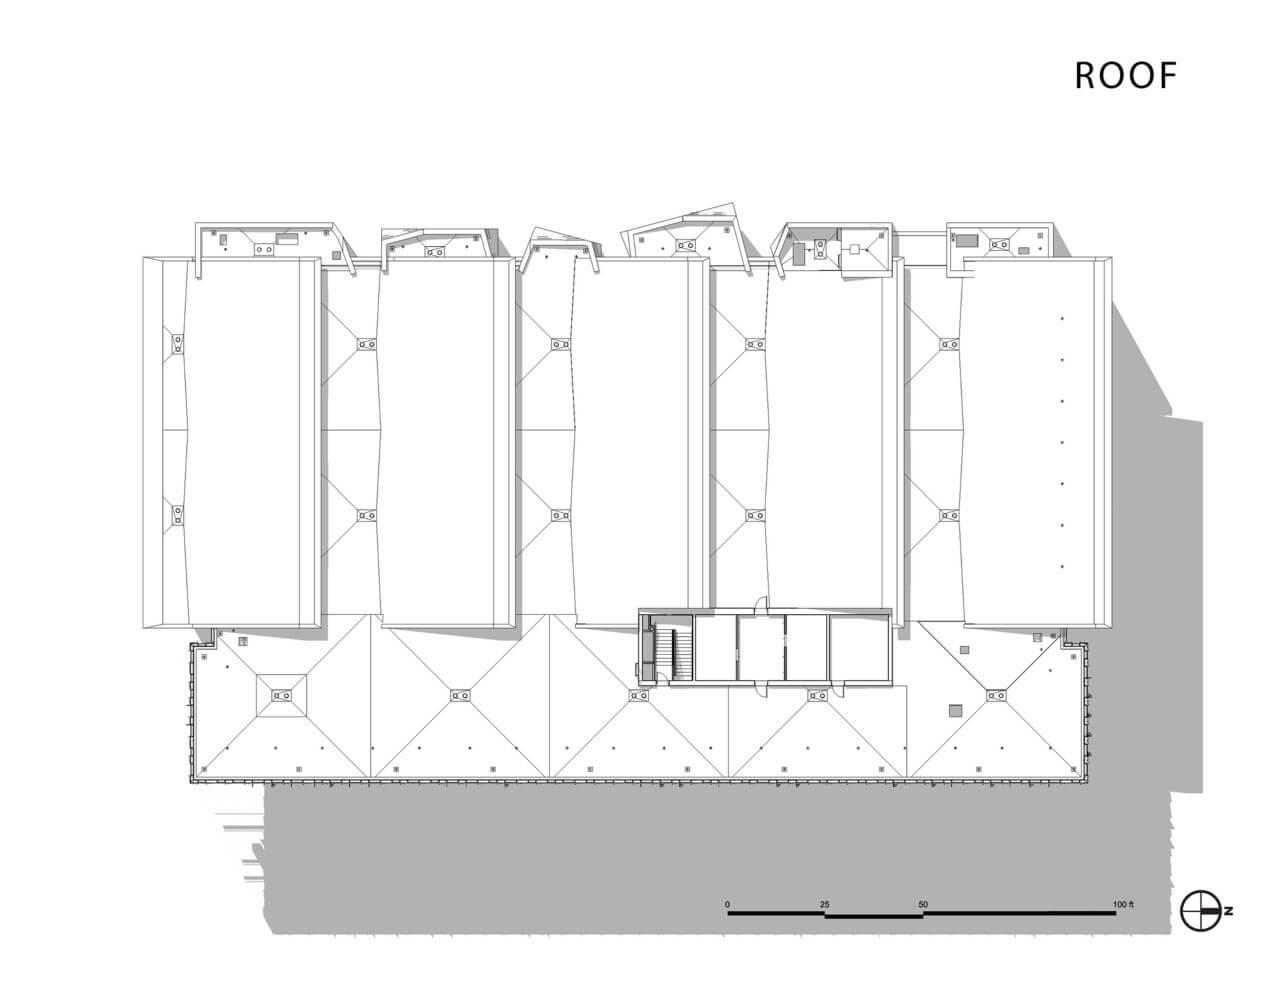 55_CO_Tucson-HSIB_Floorplan_Level-ROOF-1280x989